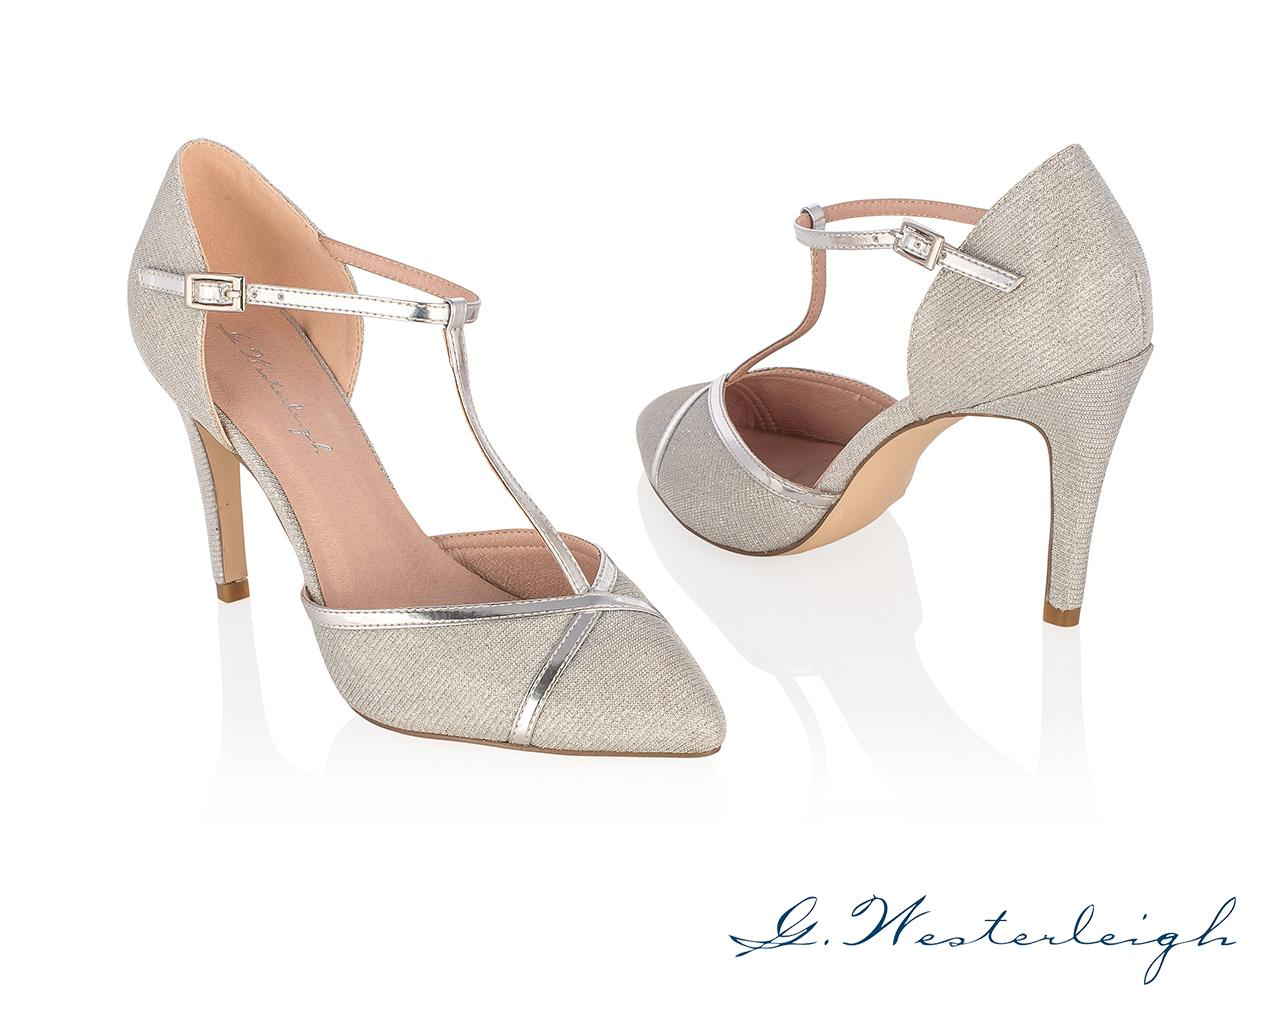 Spoločenské topánky Zaragoza - Obrázok č. 1